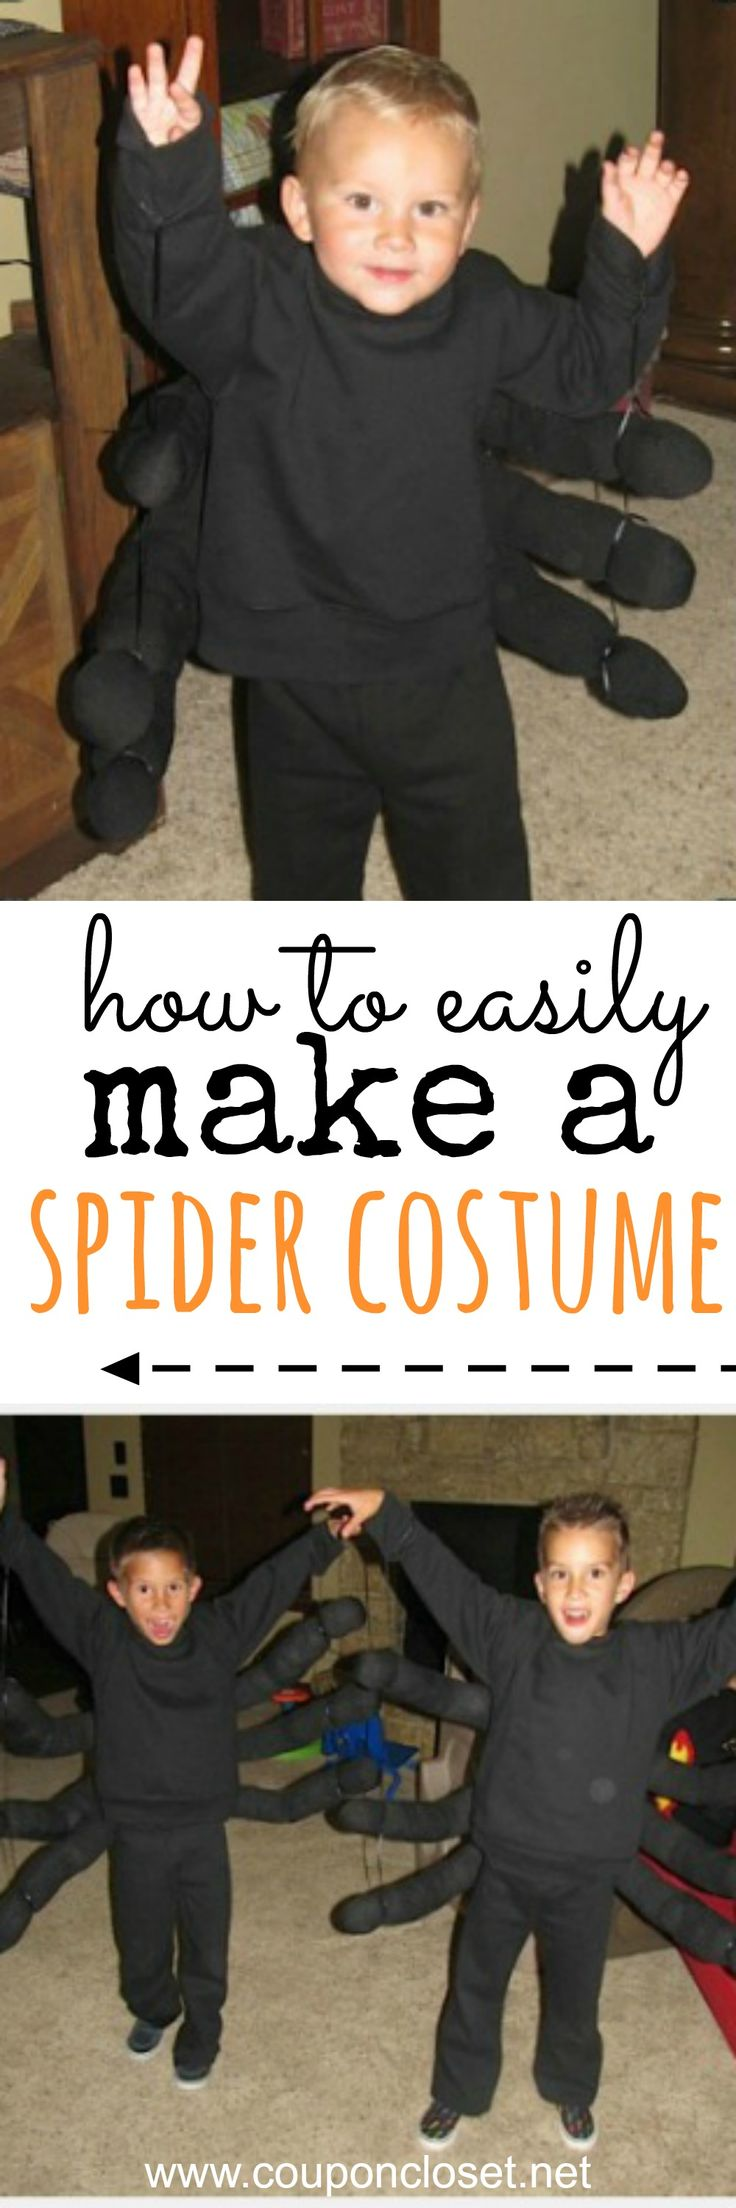 Best 25+ Homemade halloween costumes ideas on Pinterest | Couple ...